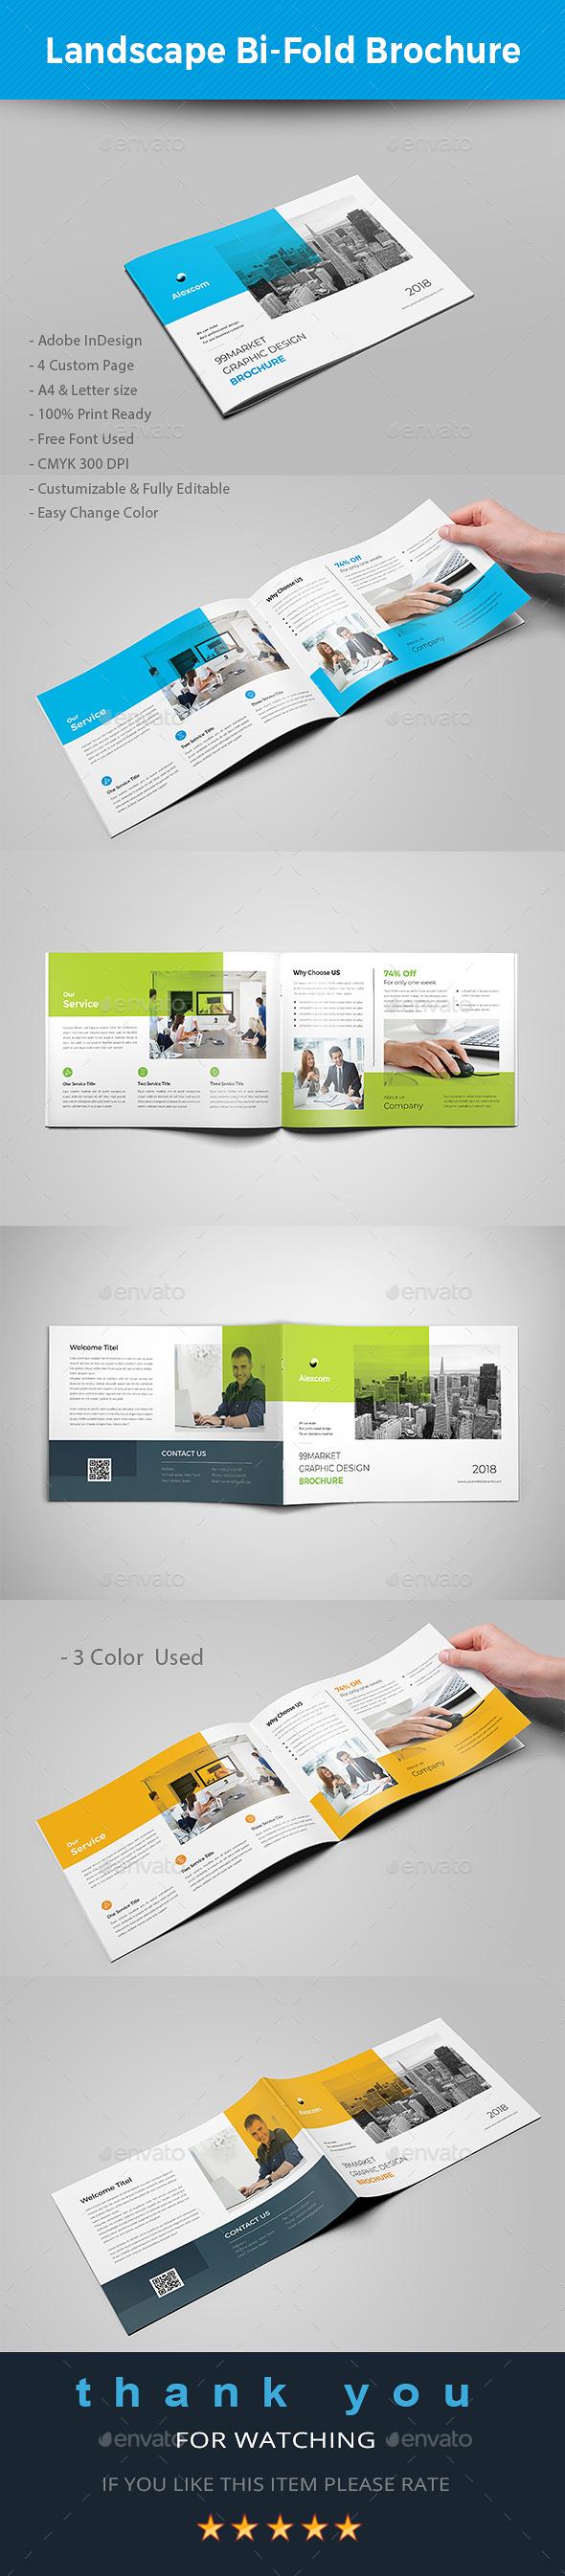 Landscape Bifold Brochure - Brochures Print Templates